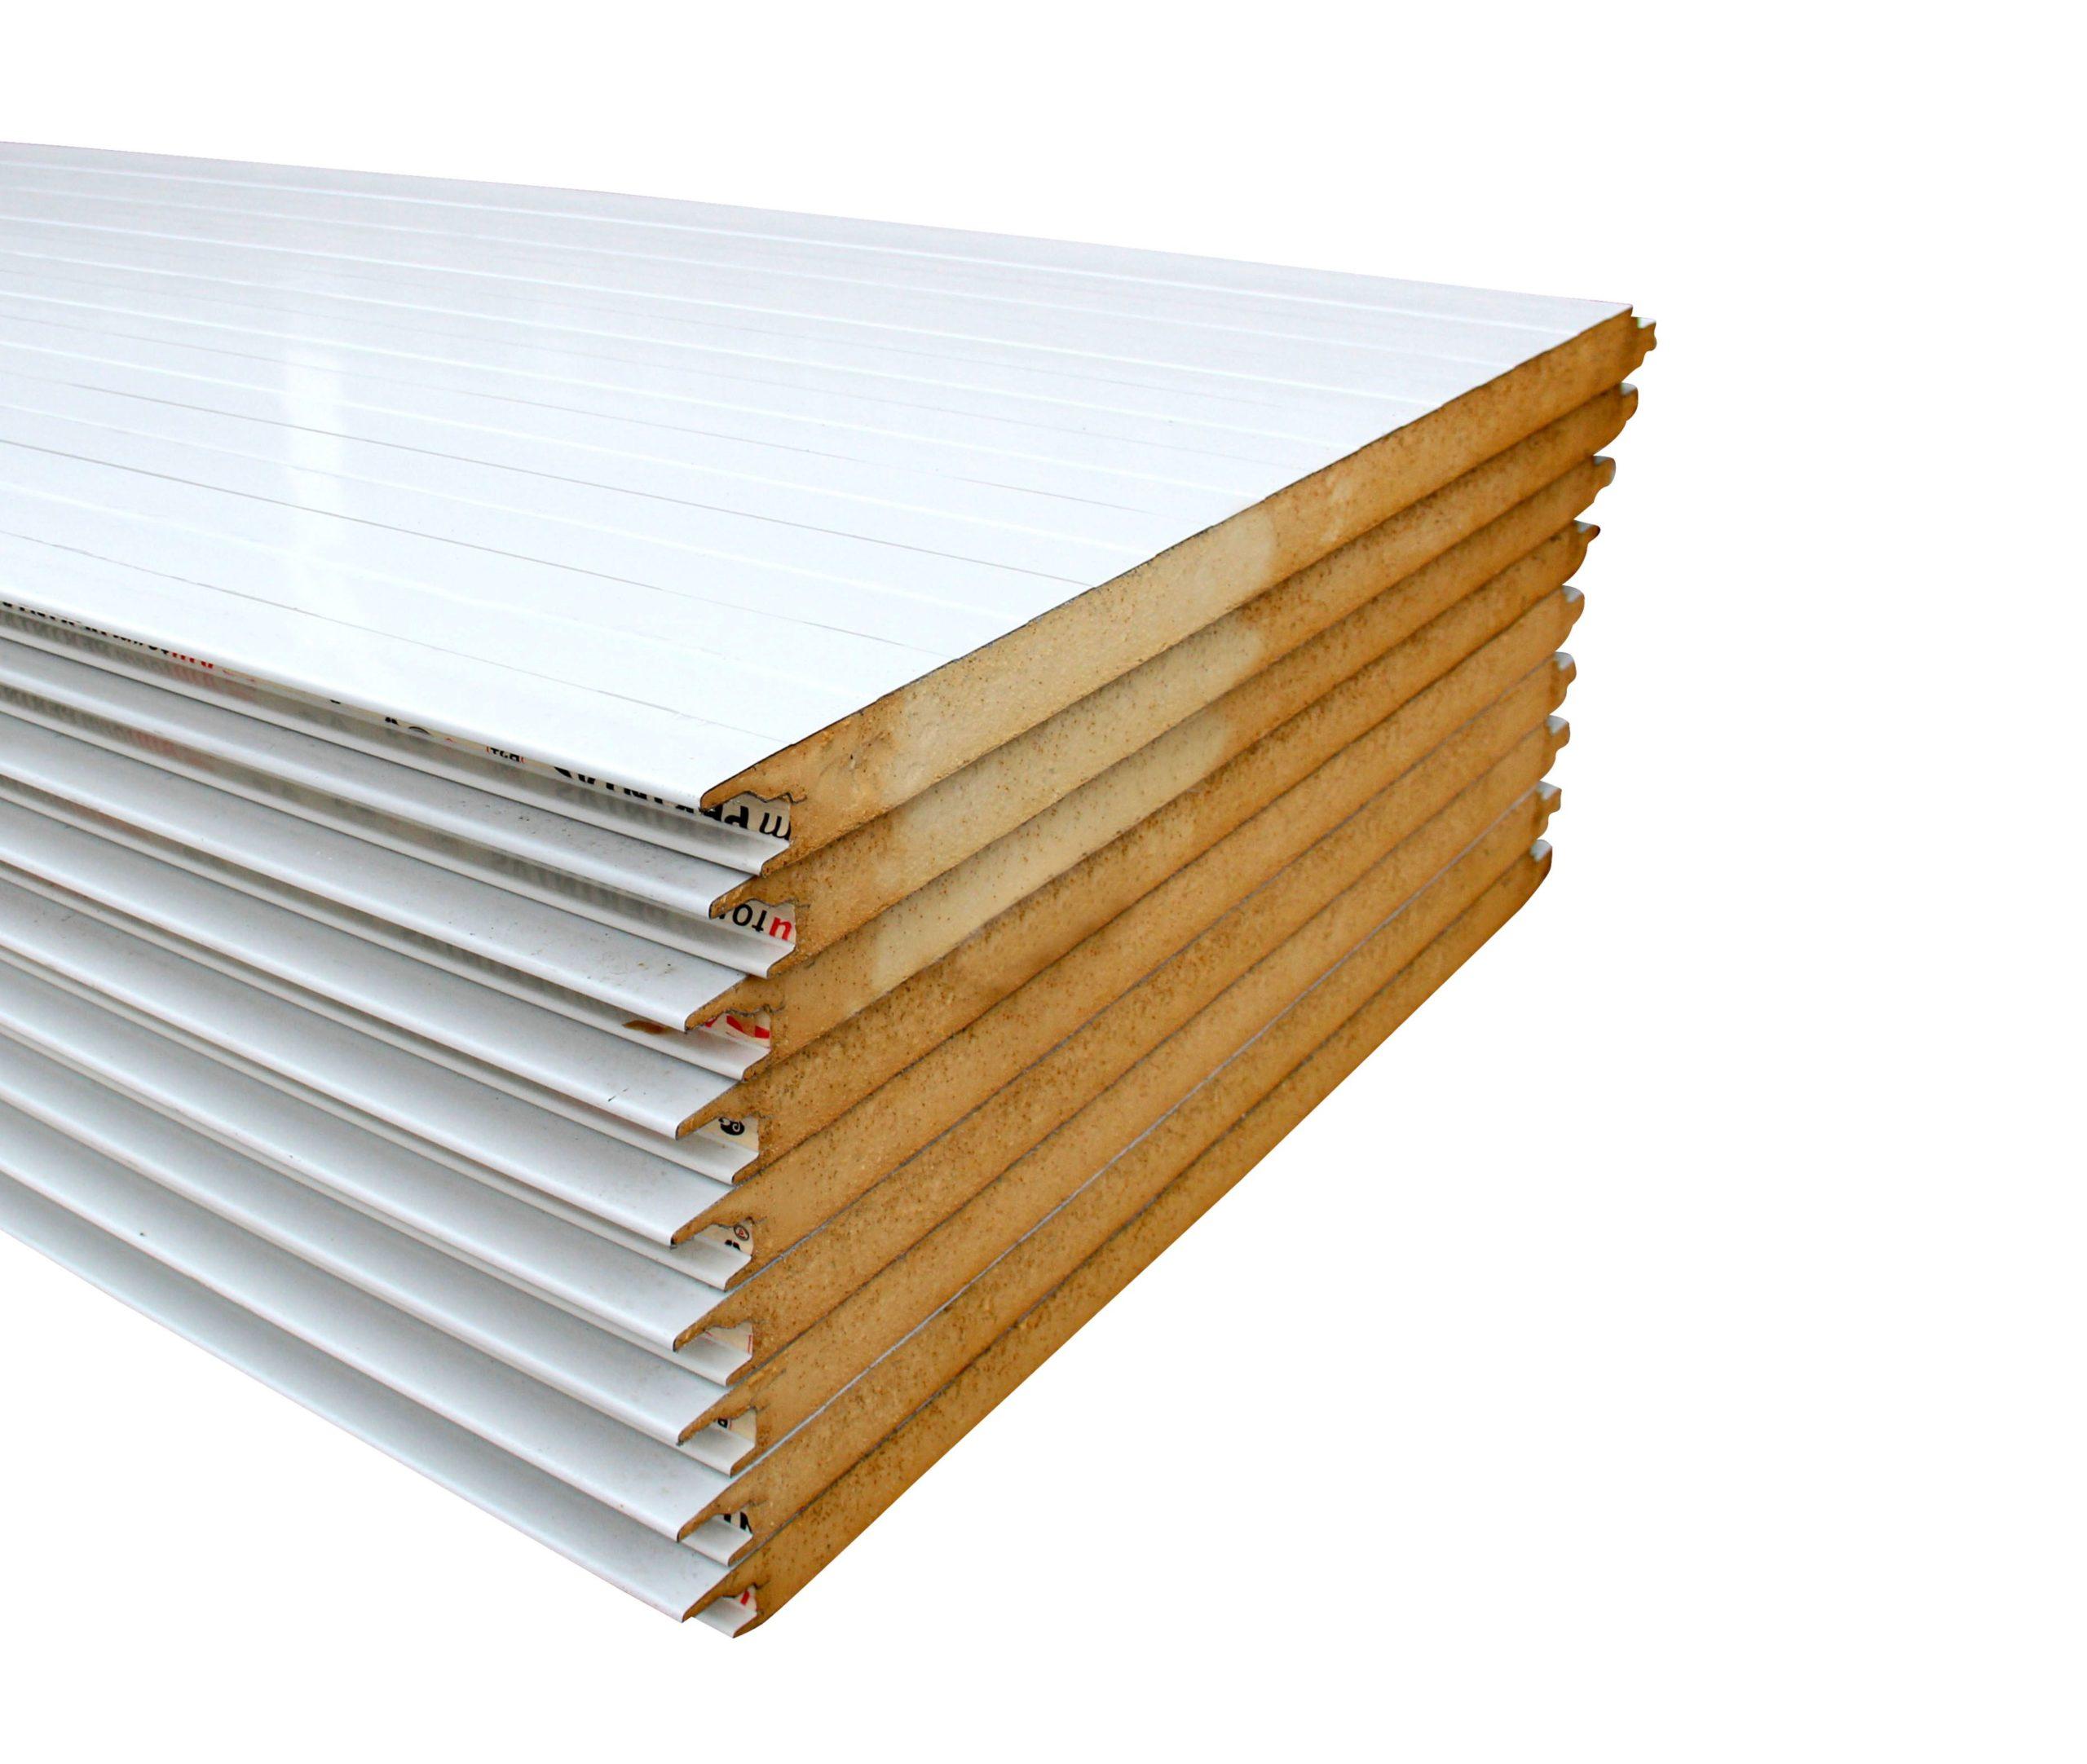 Boyalı Sac Panel (6m)-4527